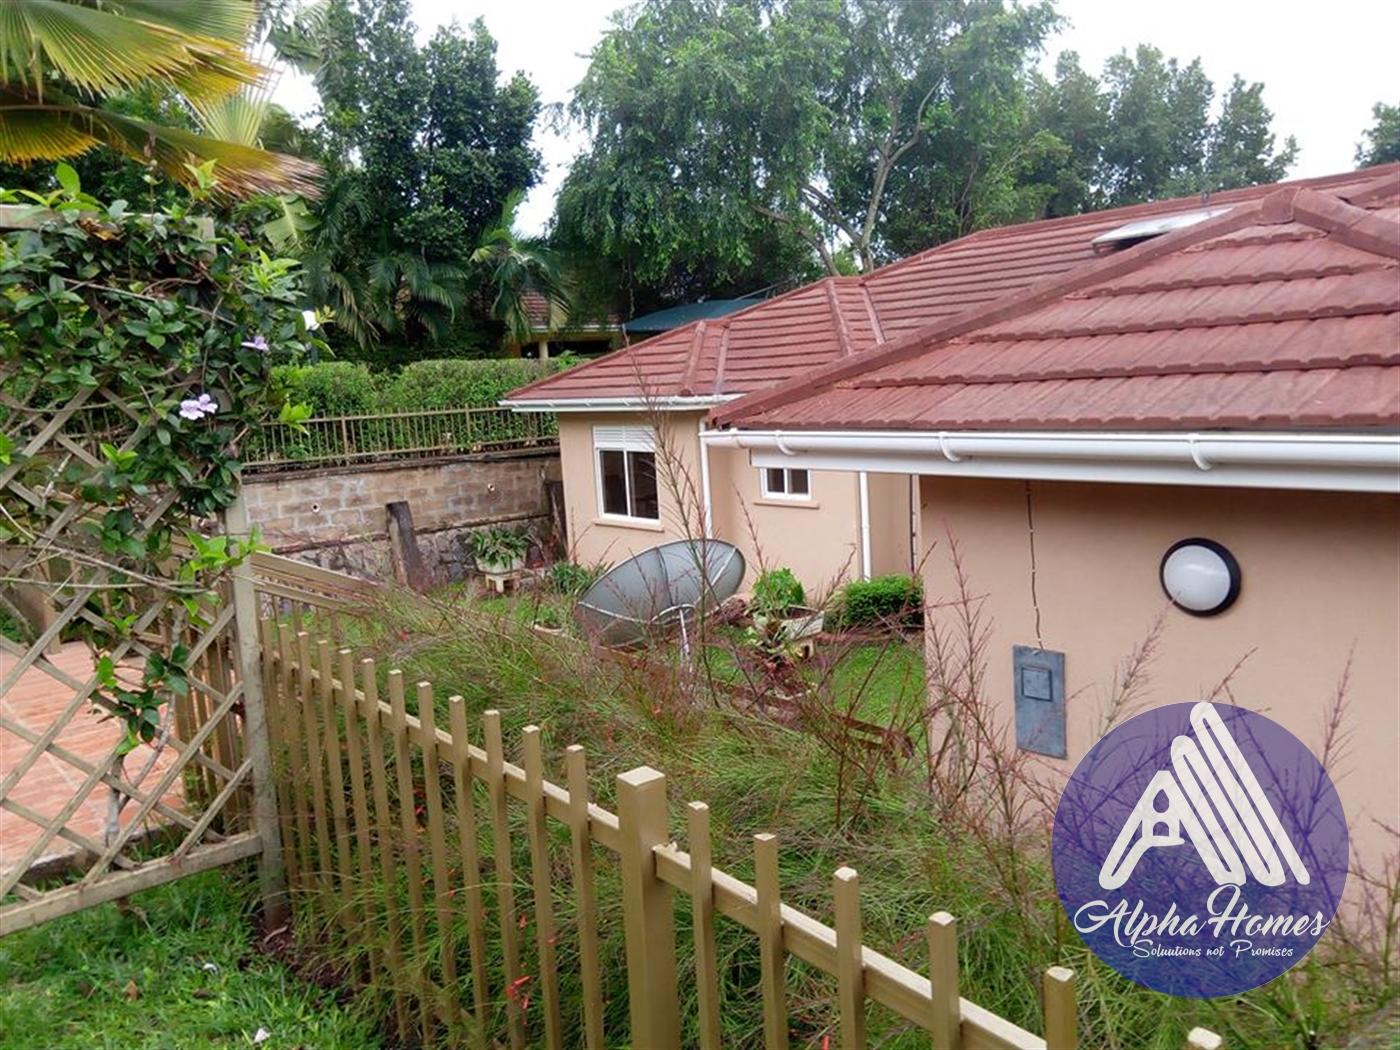 Apartment for rent in Munyonyo Kamuli